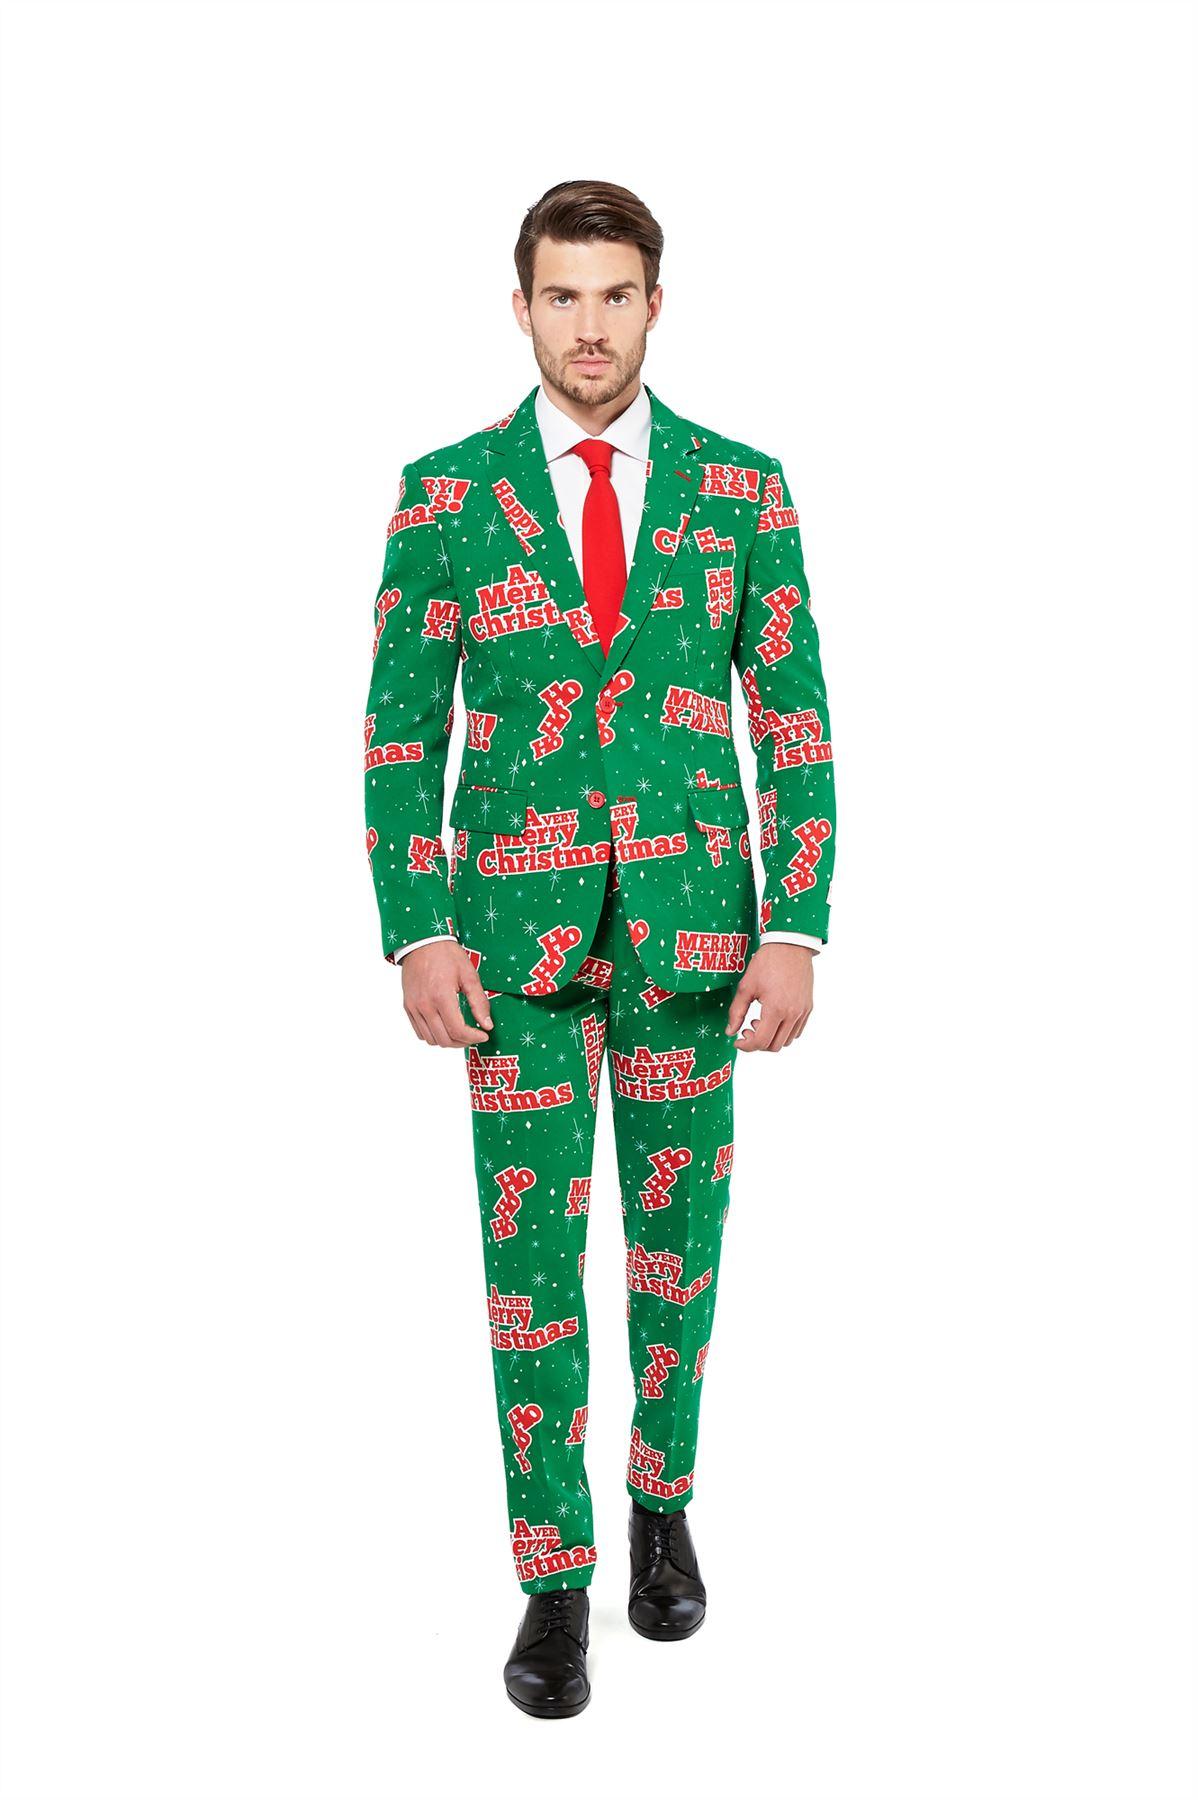 mens christmas opposuit fancy dress costume 3 piece suit deluxe festive outfit ebay. Black Bedroom Furniture Sets. Home Design Ideas